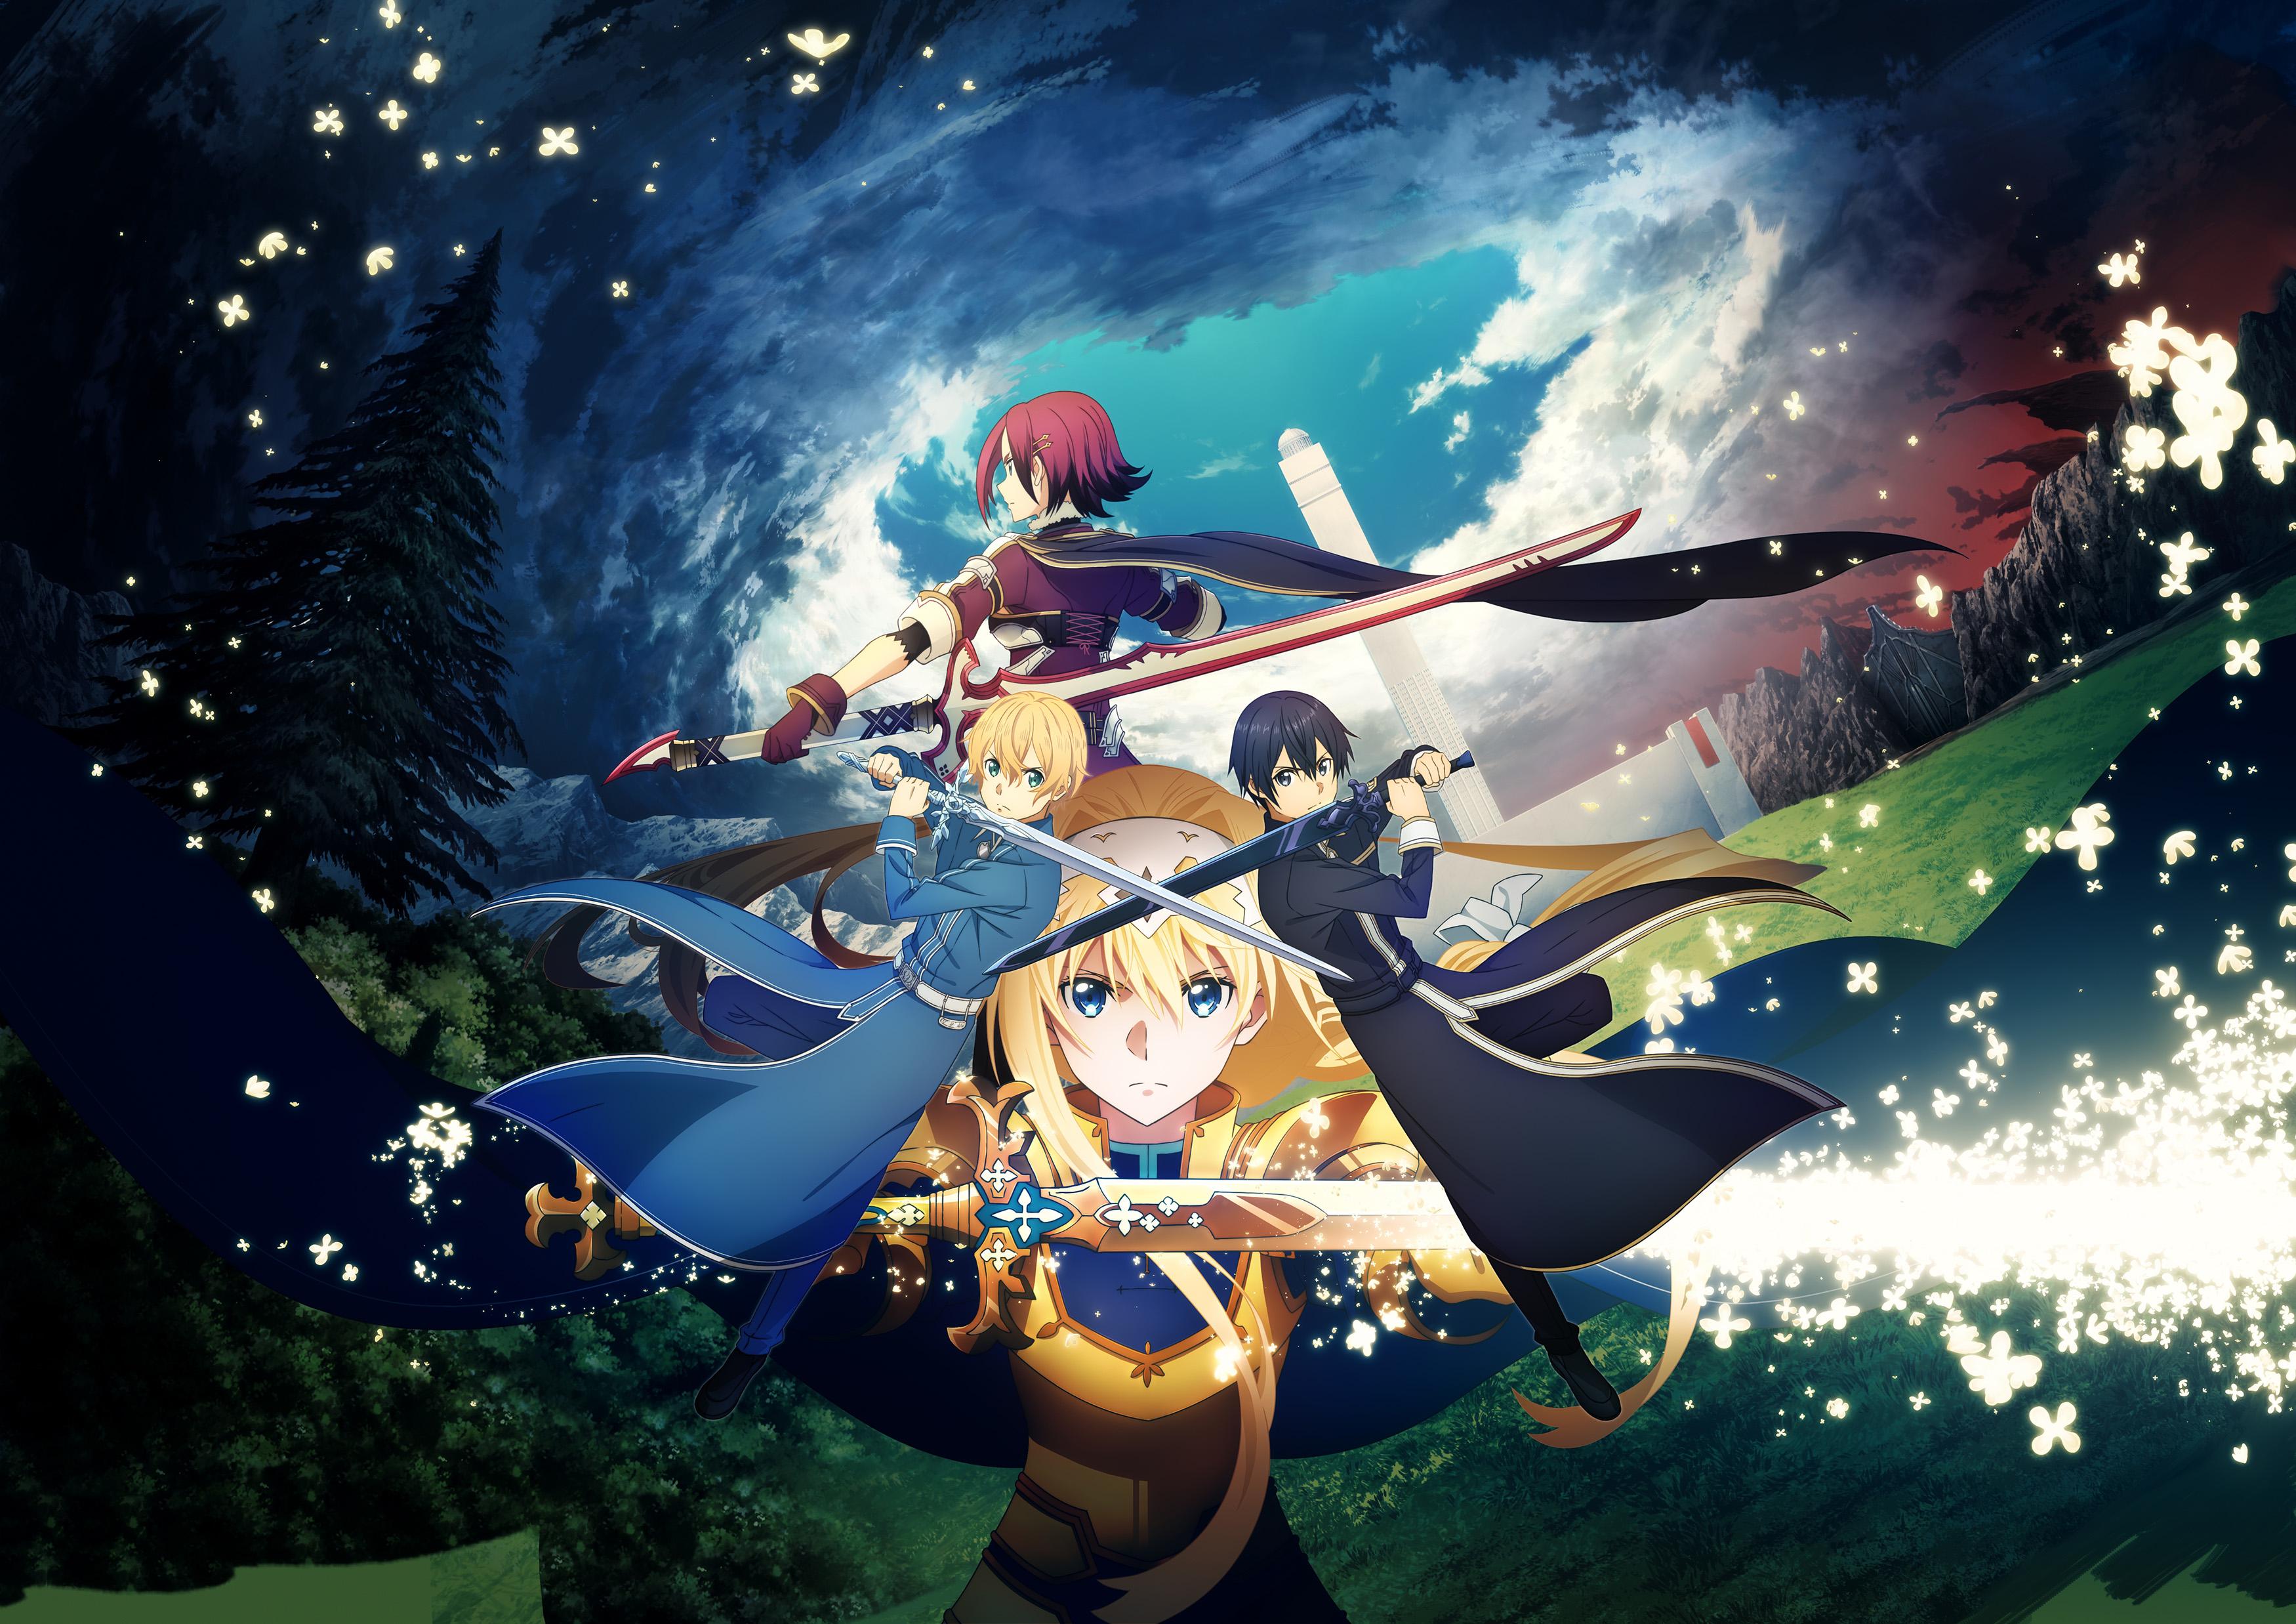 Sword Art Online Alicization Lycoris Wallpaper Hd Games 4k